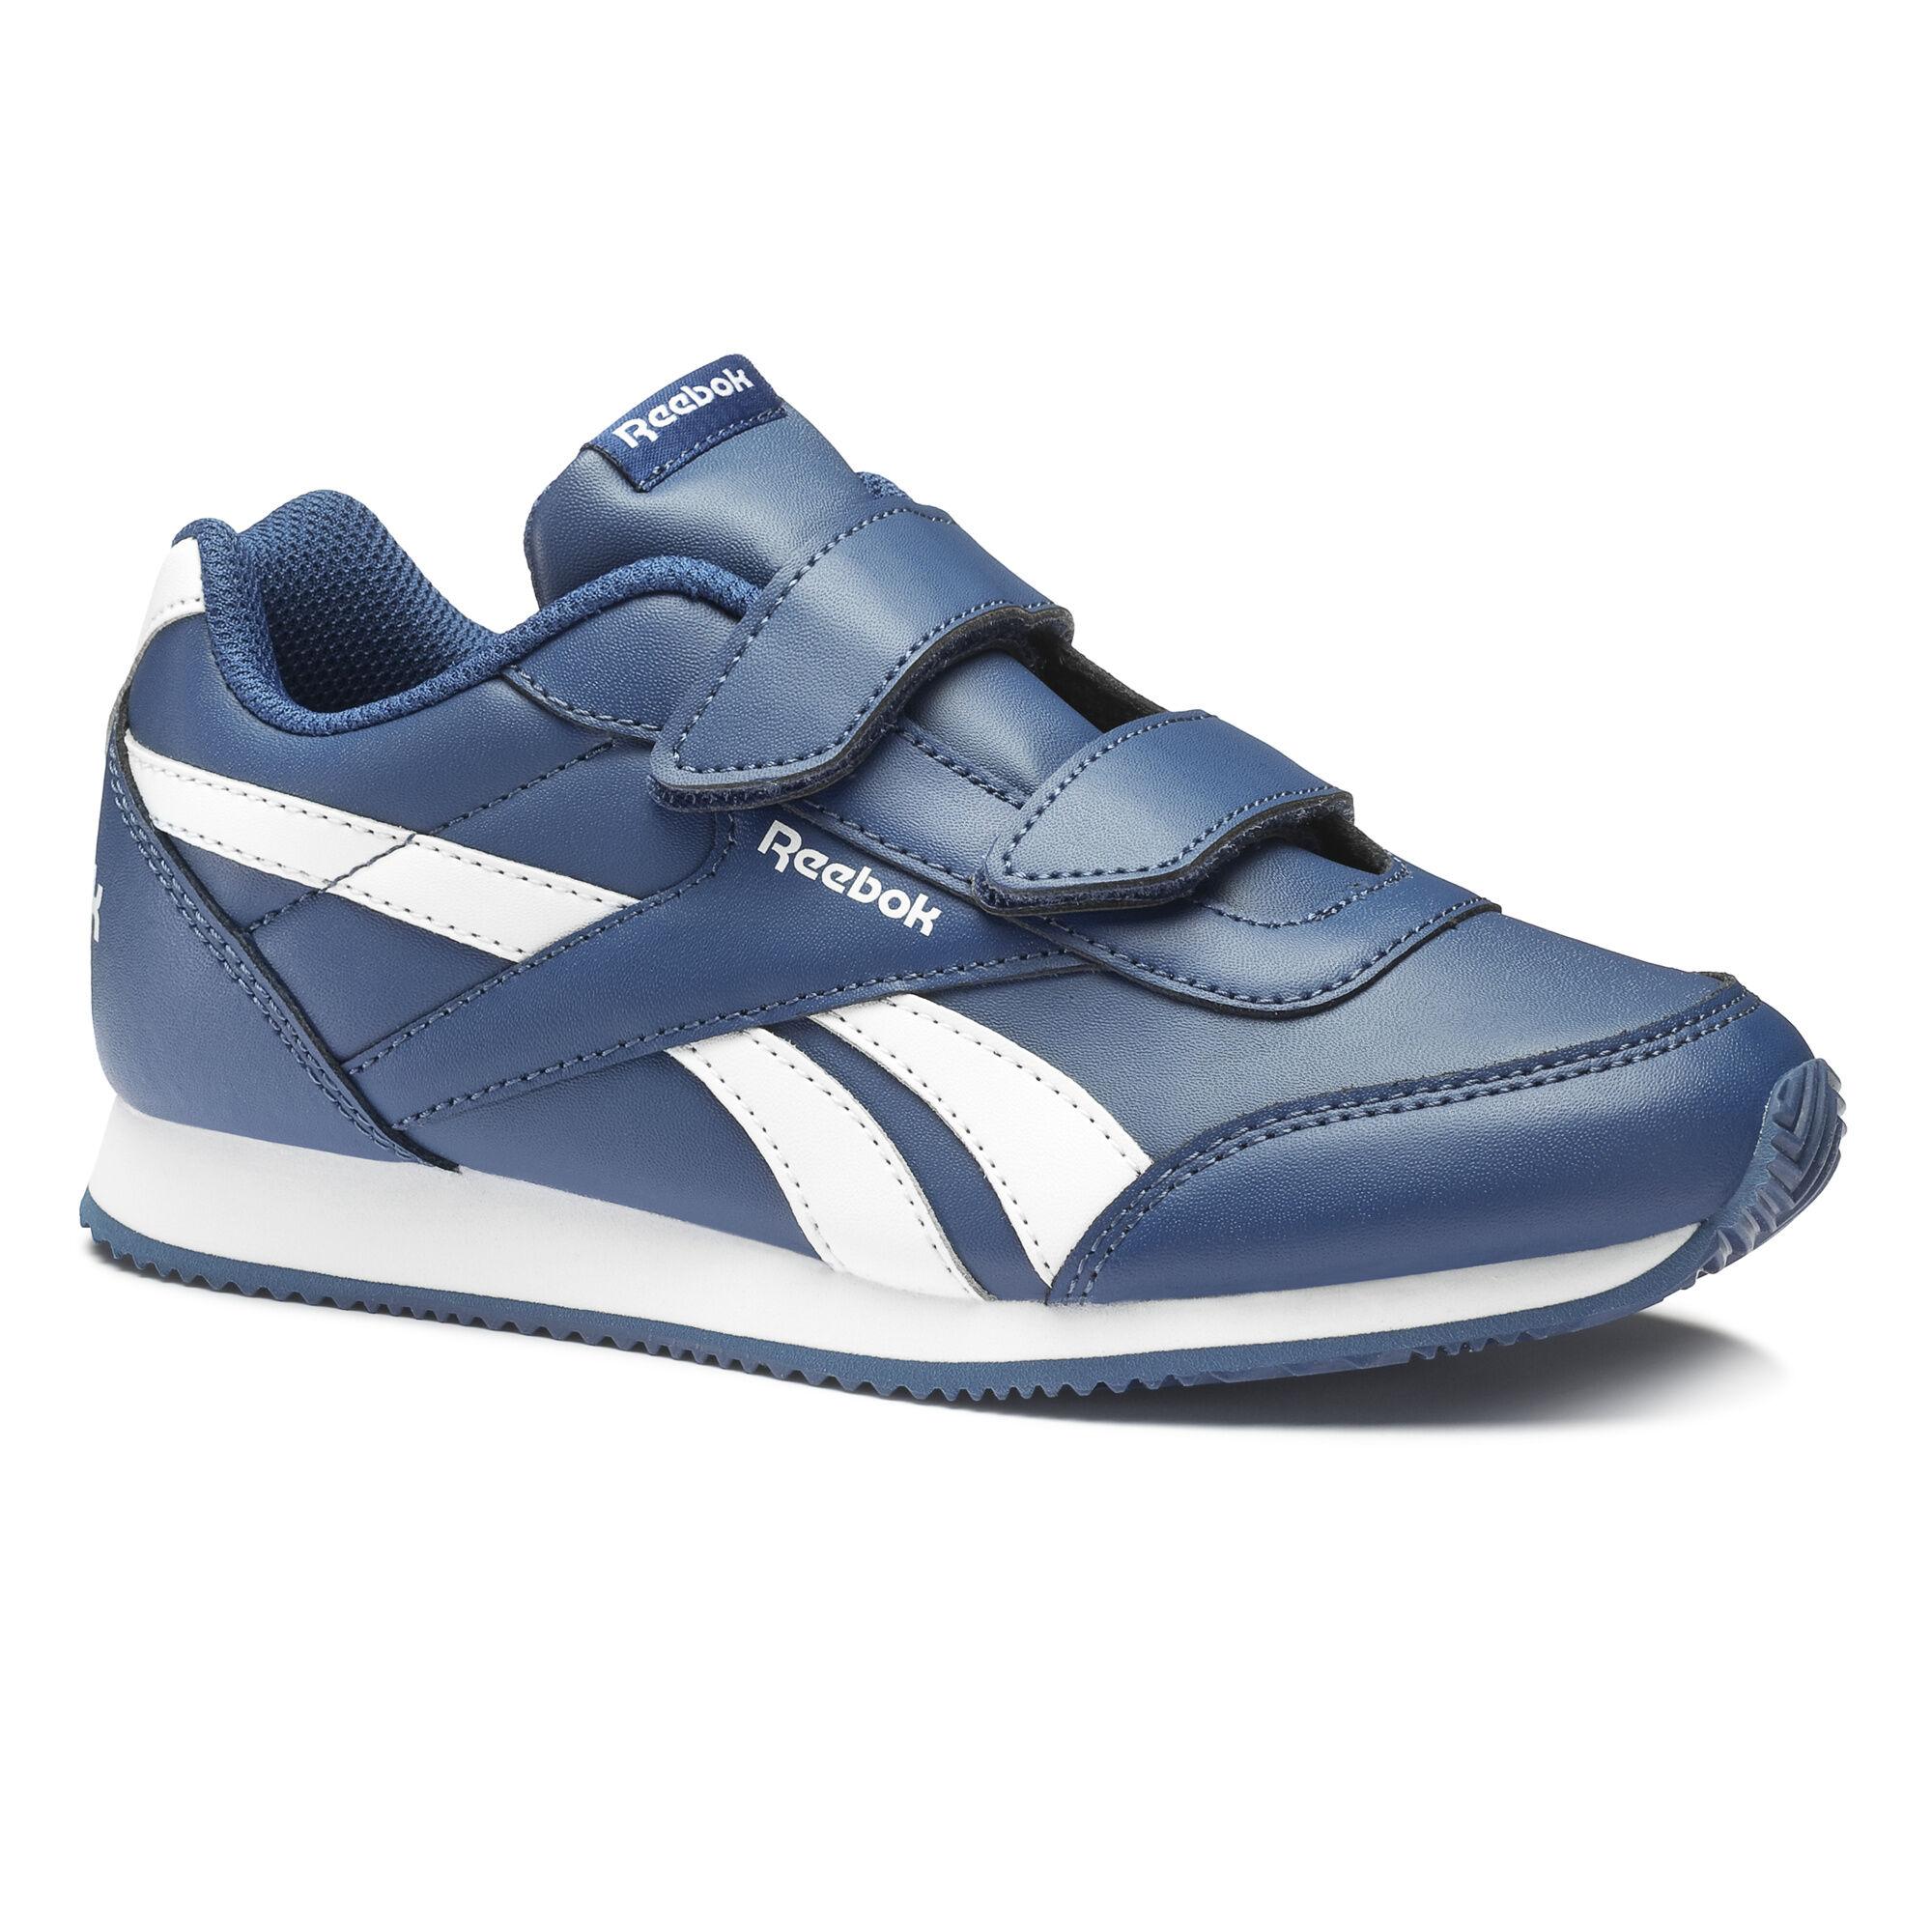 Reebok Royal Classic Jogger - Blue  223f367177fc5